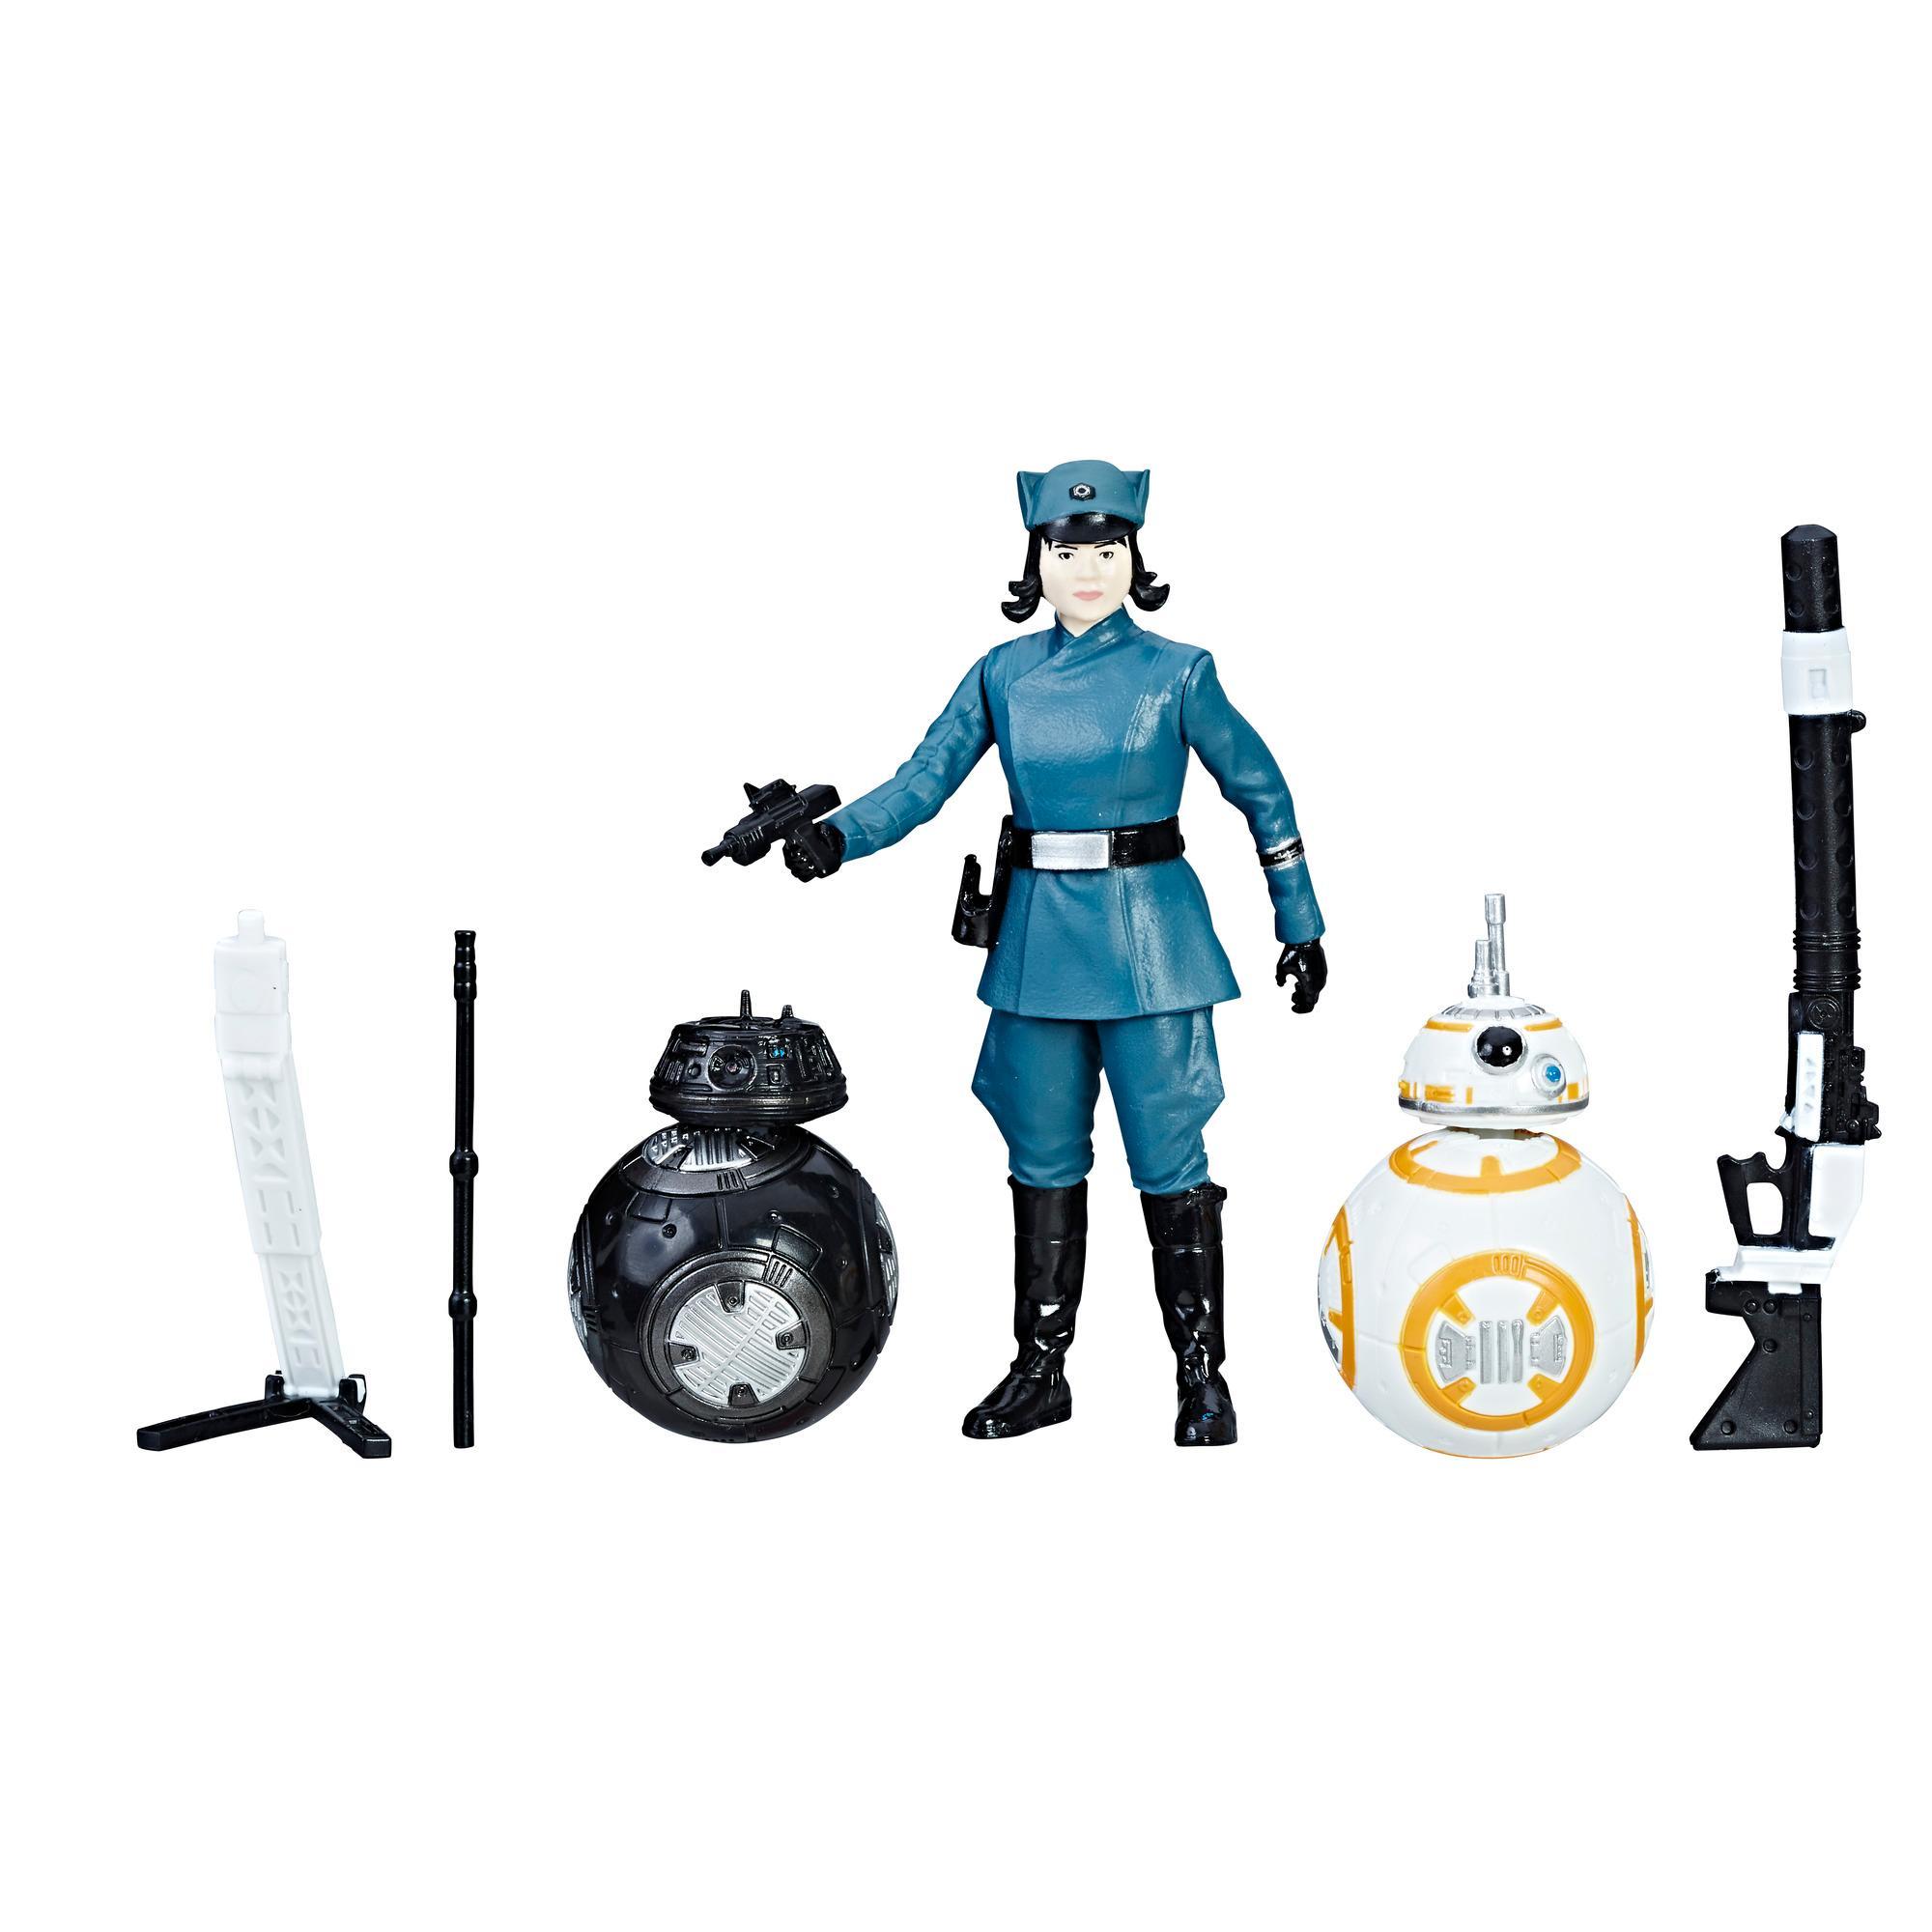 Star Wars - Force Link Rose (Disfarce da Primeira Ordem), BB-8 e BB-9E